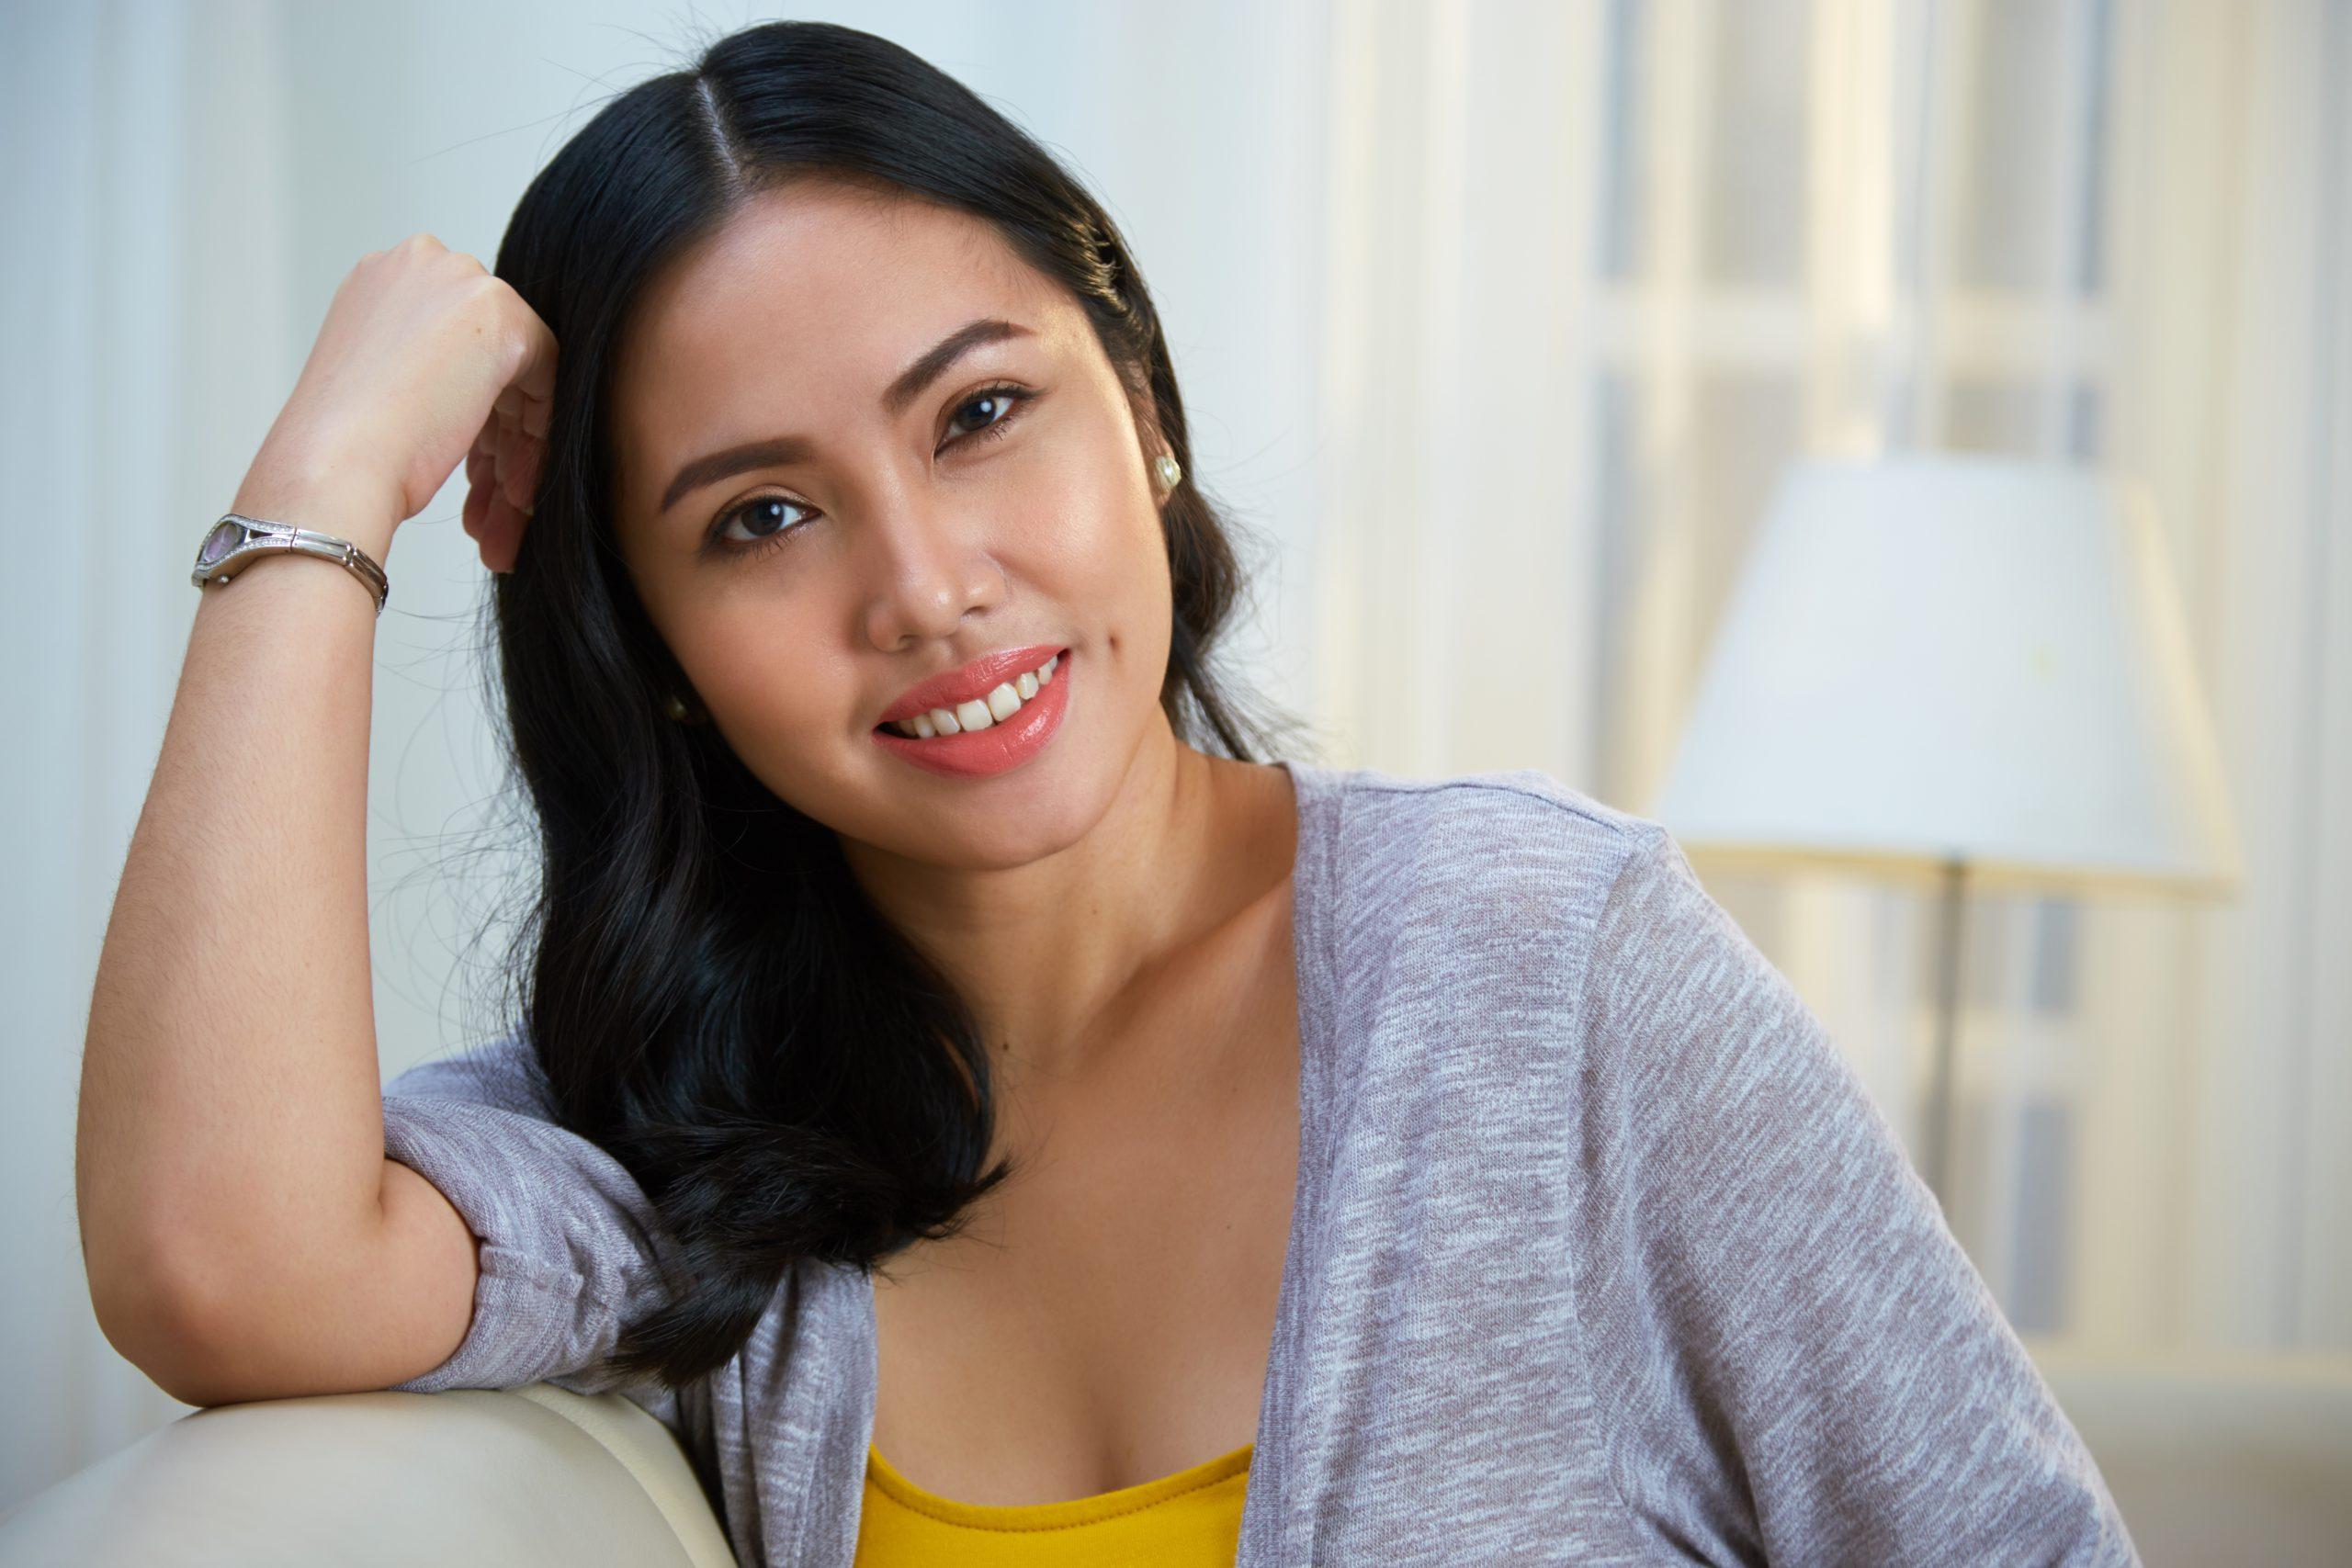 Charming Filipino woman leaning on sofa back